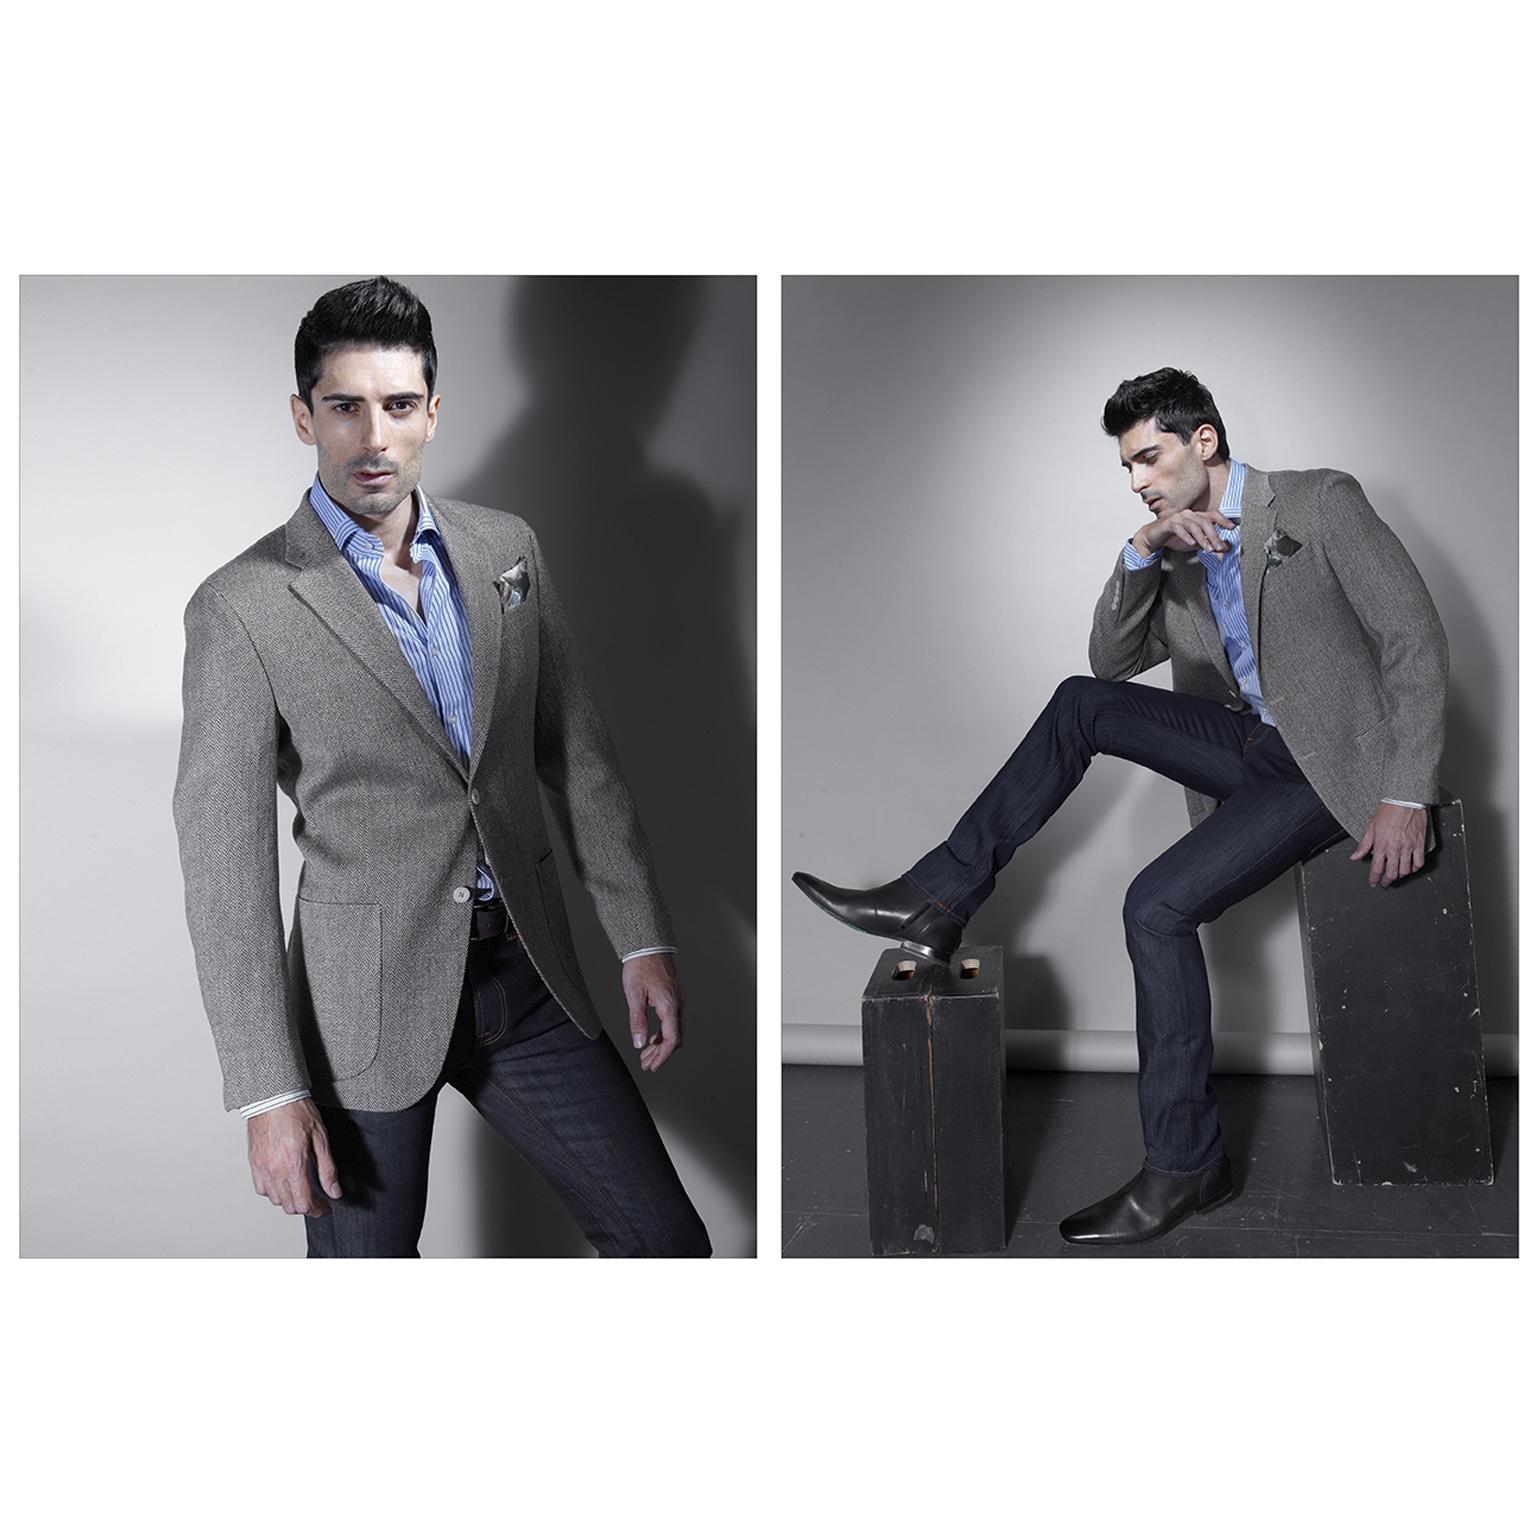 Toronto-Fitness-Model-Agency-Fitness-Casual-Commercial-Simon-Lazzerini-Headshot-Model-Lifestyle-Fashion